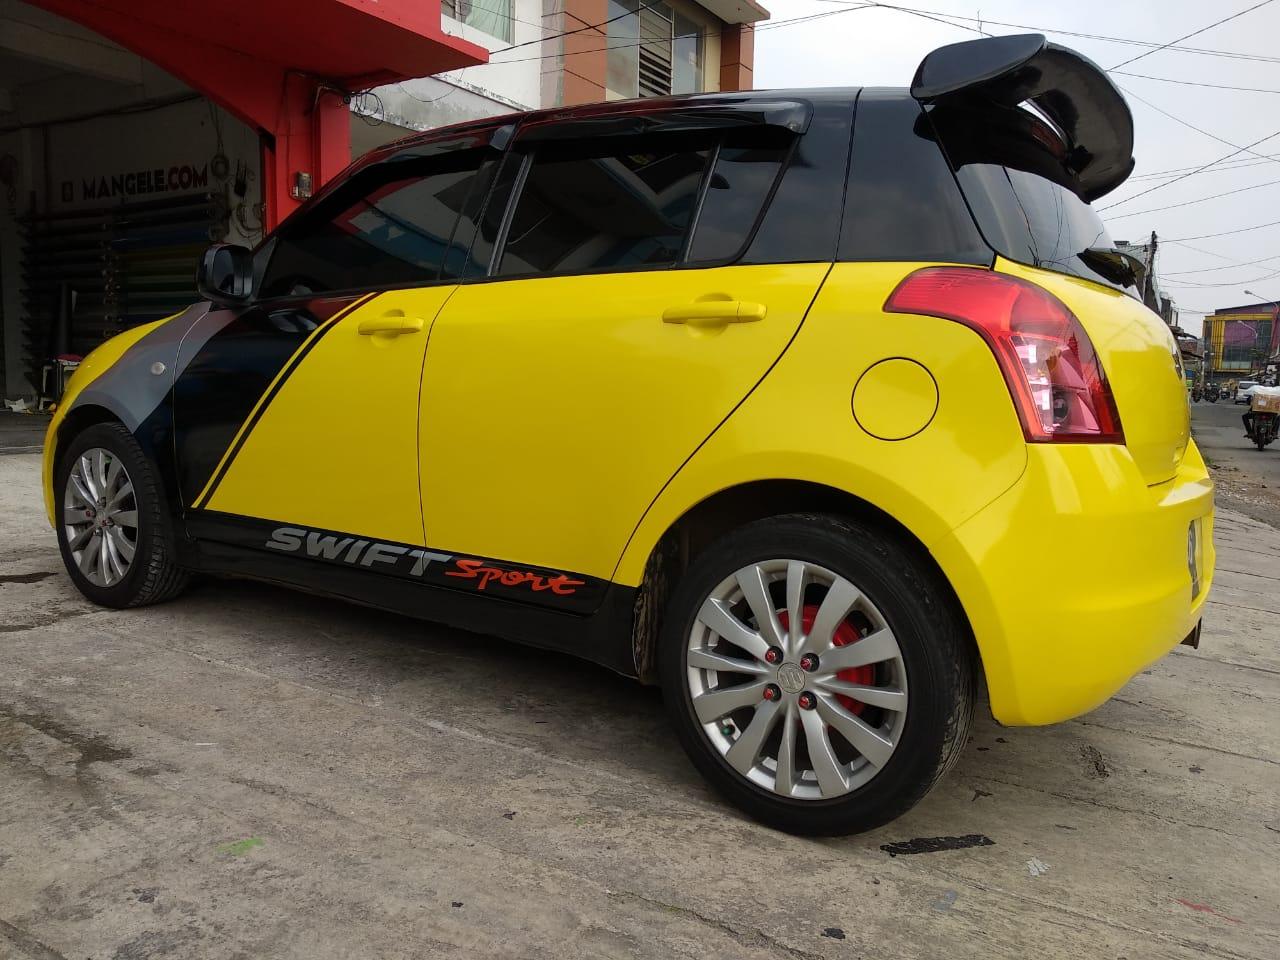 Mau Style Mobil Makin Keren? Ayo Mampir Ke Mangele Sticker Bandung Terbaik